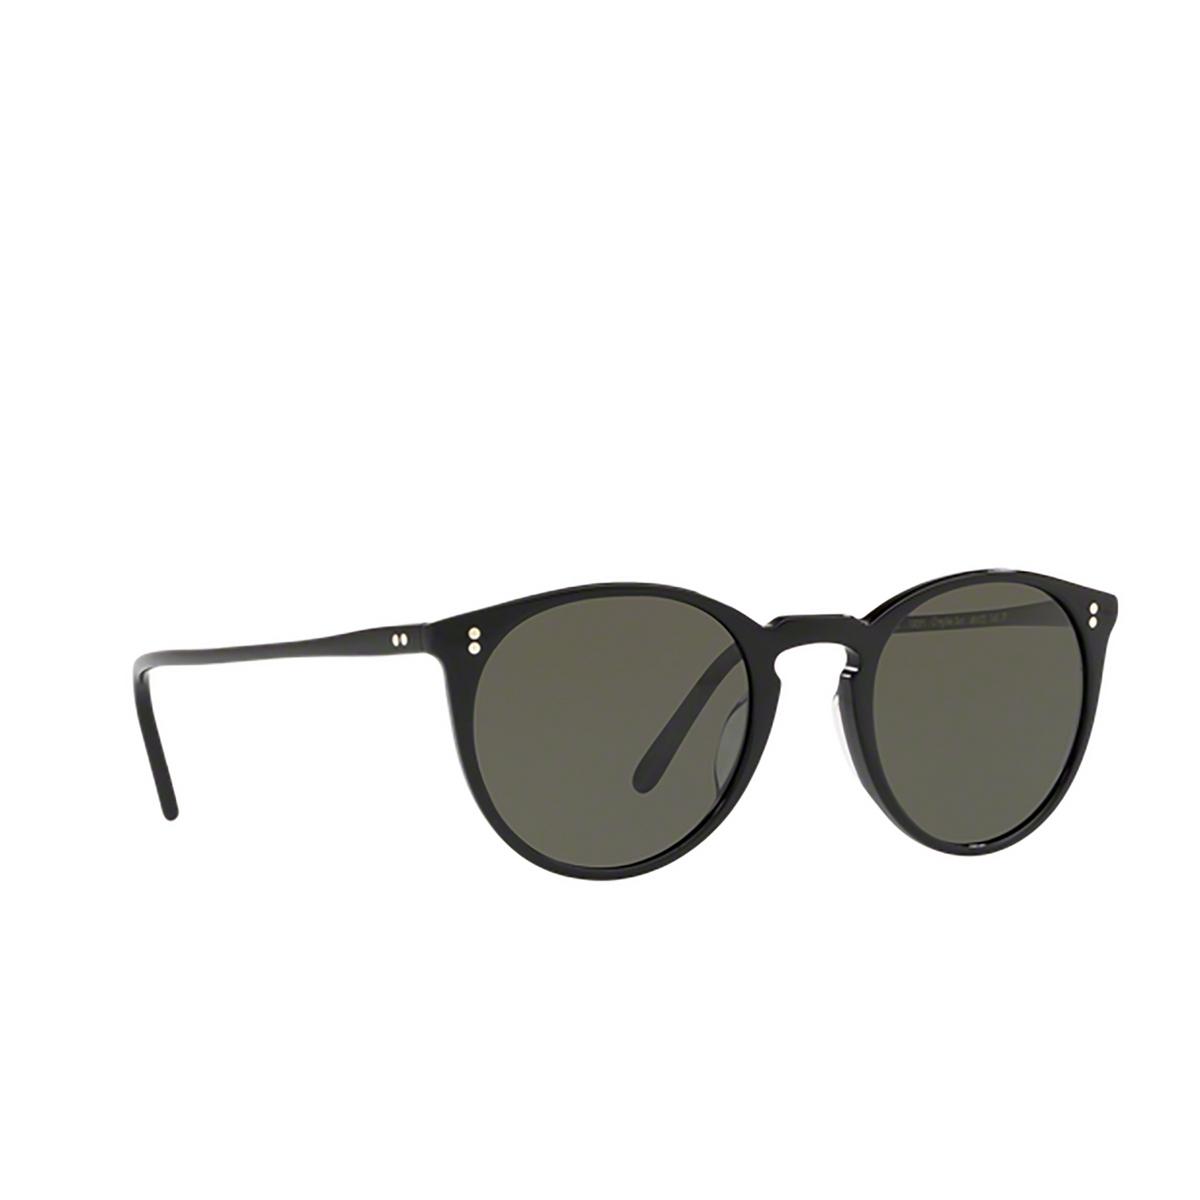 Oliver Peoples® Round Sunglasses: O'malley Sun OV5183S color Black 1005P1 - three-quarters view.